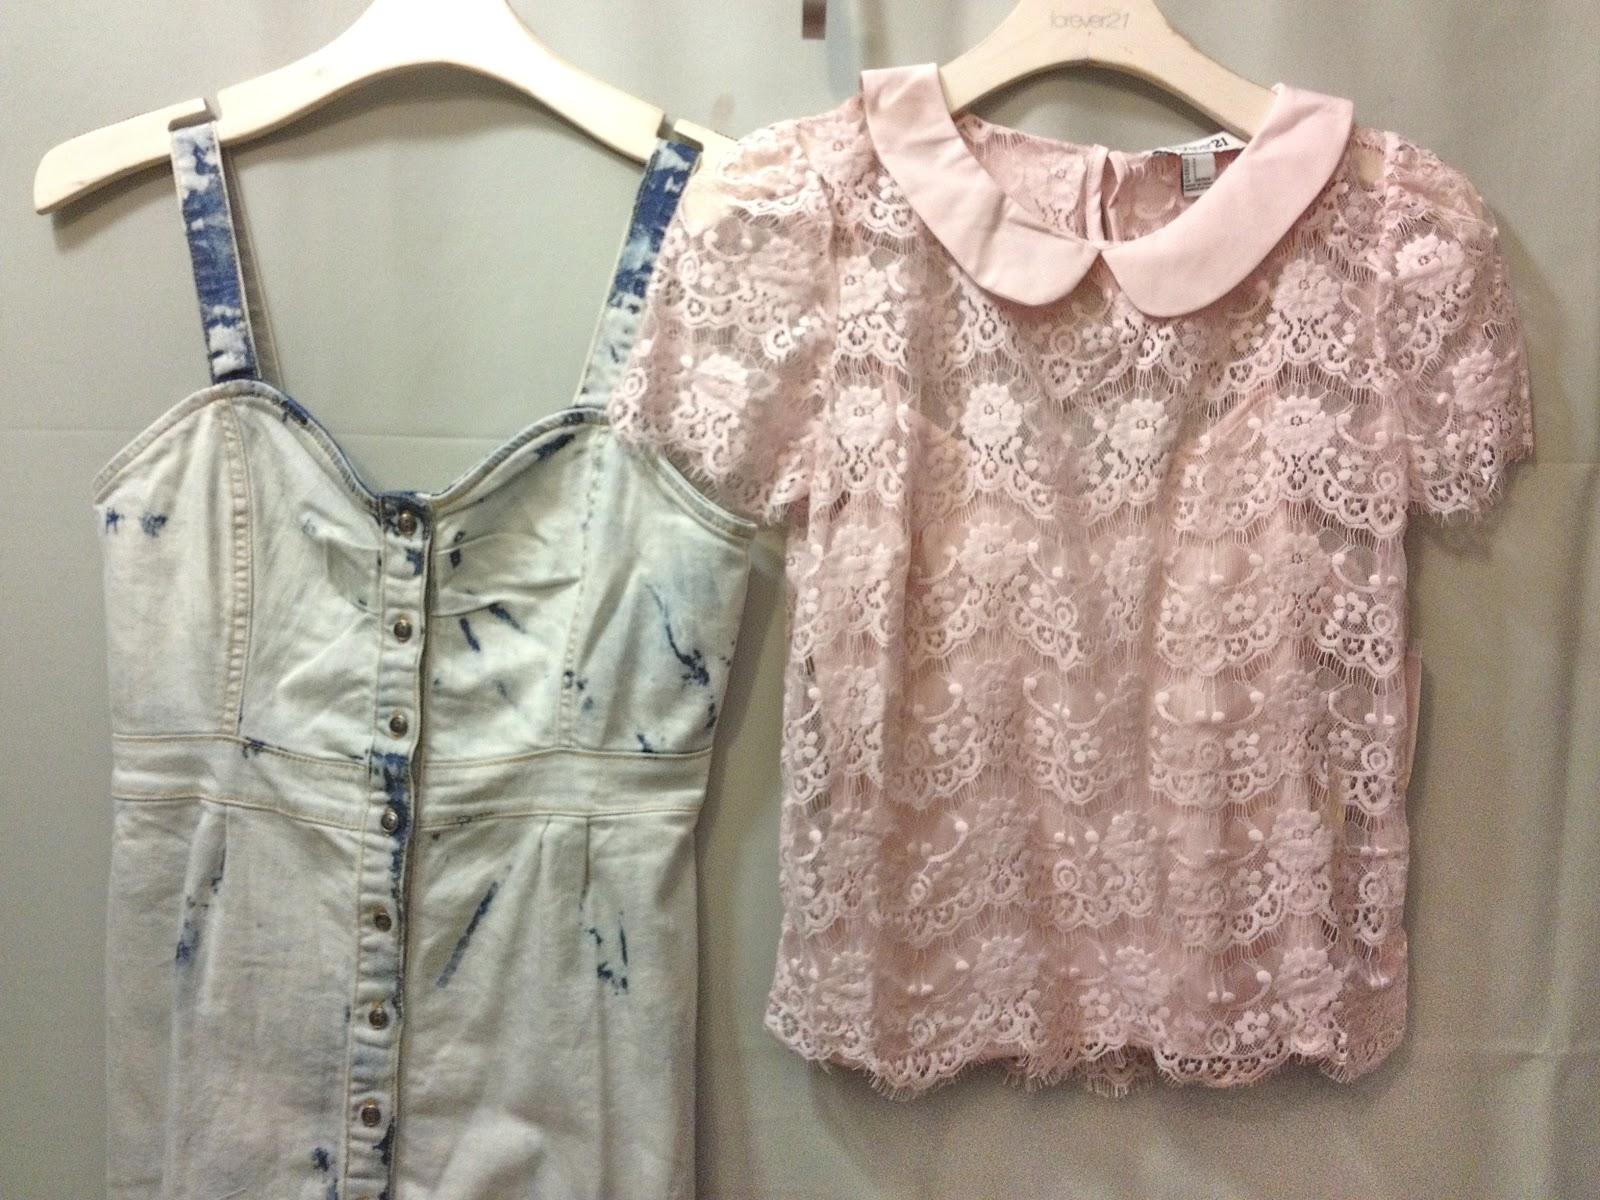 http://4.bp.blogspot.com/-sO6QdavNYN4/UAyroZZXqiI/AAAAAAAABic/Z-dOSvWEfp0/s1600/F21+Denim+Dress+++Pink+Top.JPG